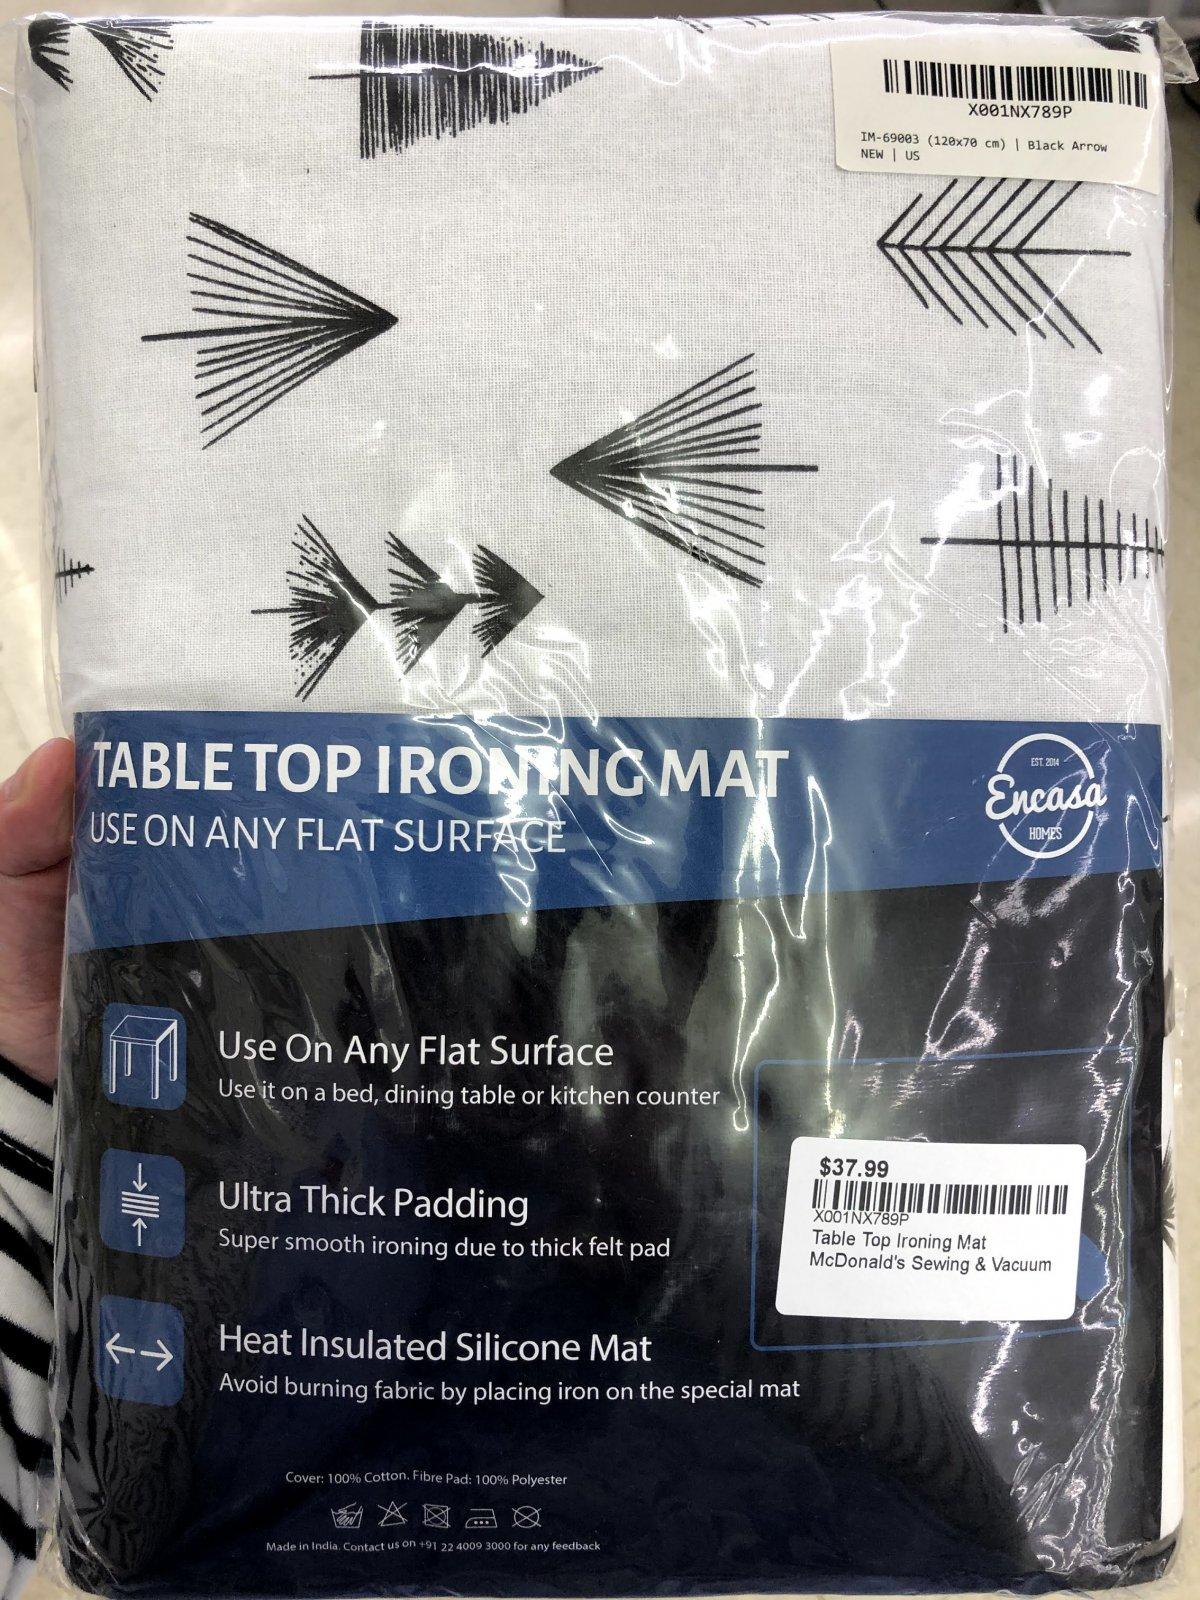 Table Top Ironing Mat